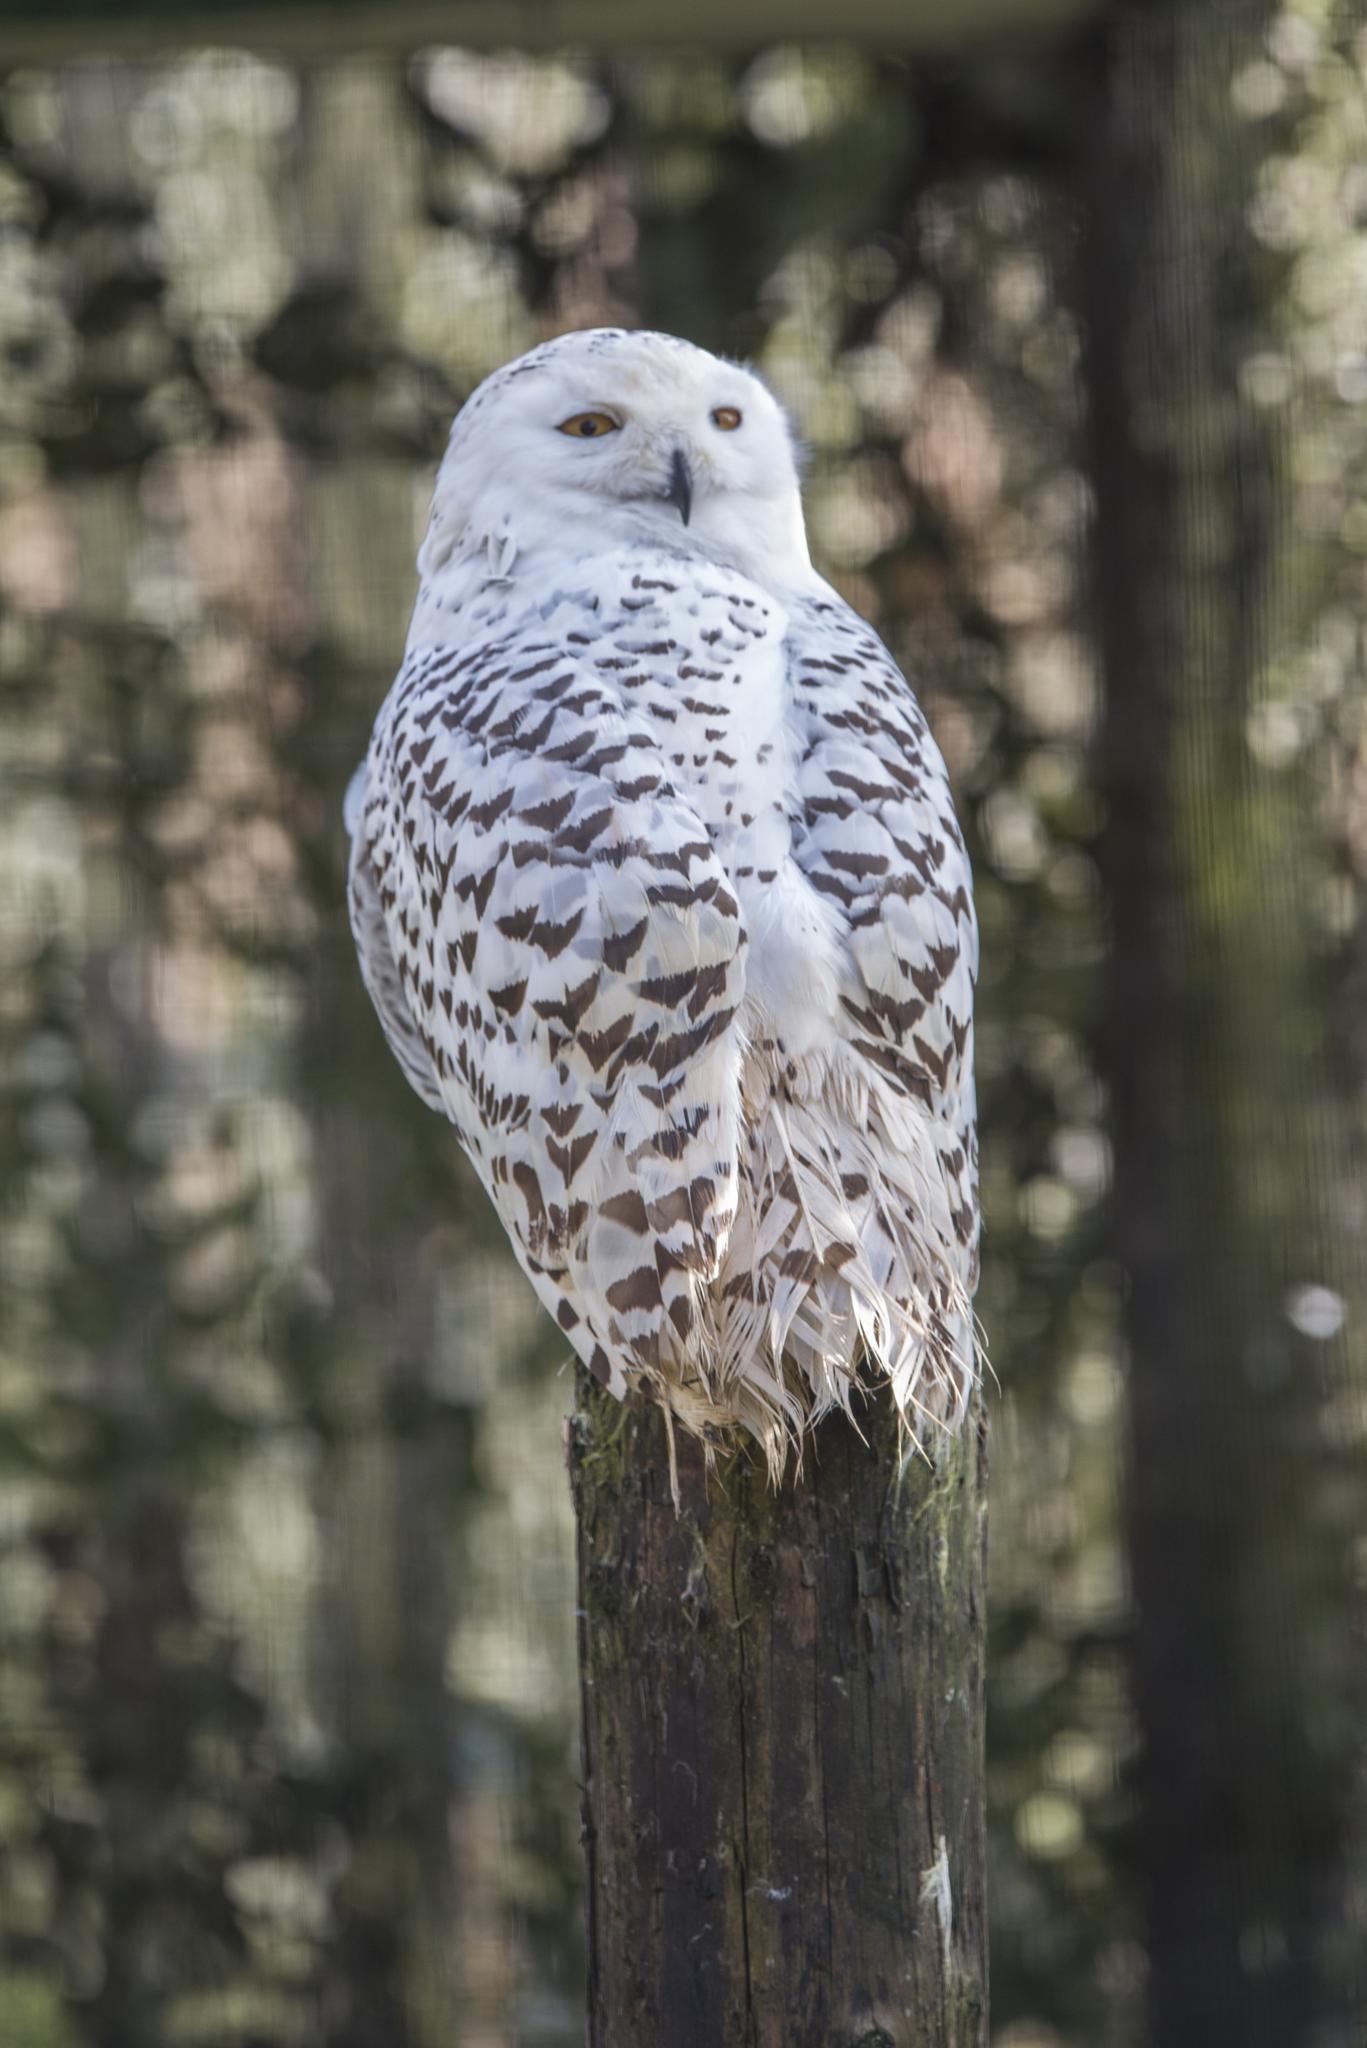 Owl by Zoltan Kovacs